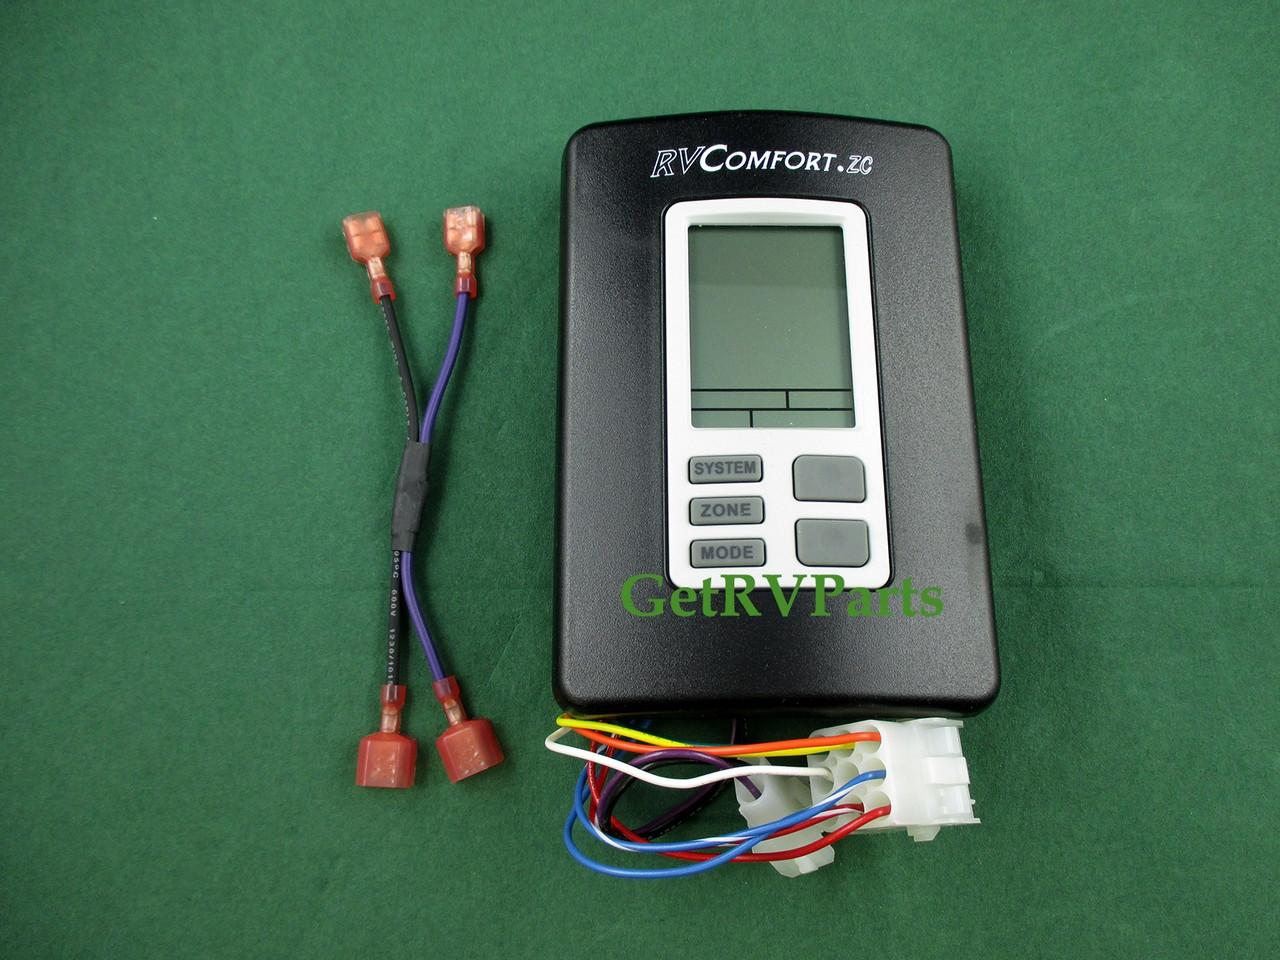 Coleman 9330-3341 RV Comfort A/C Multi Zone Thermostat Black